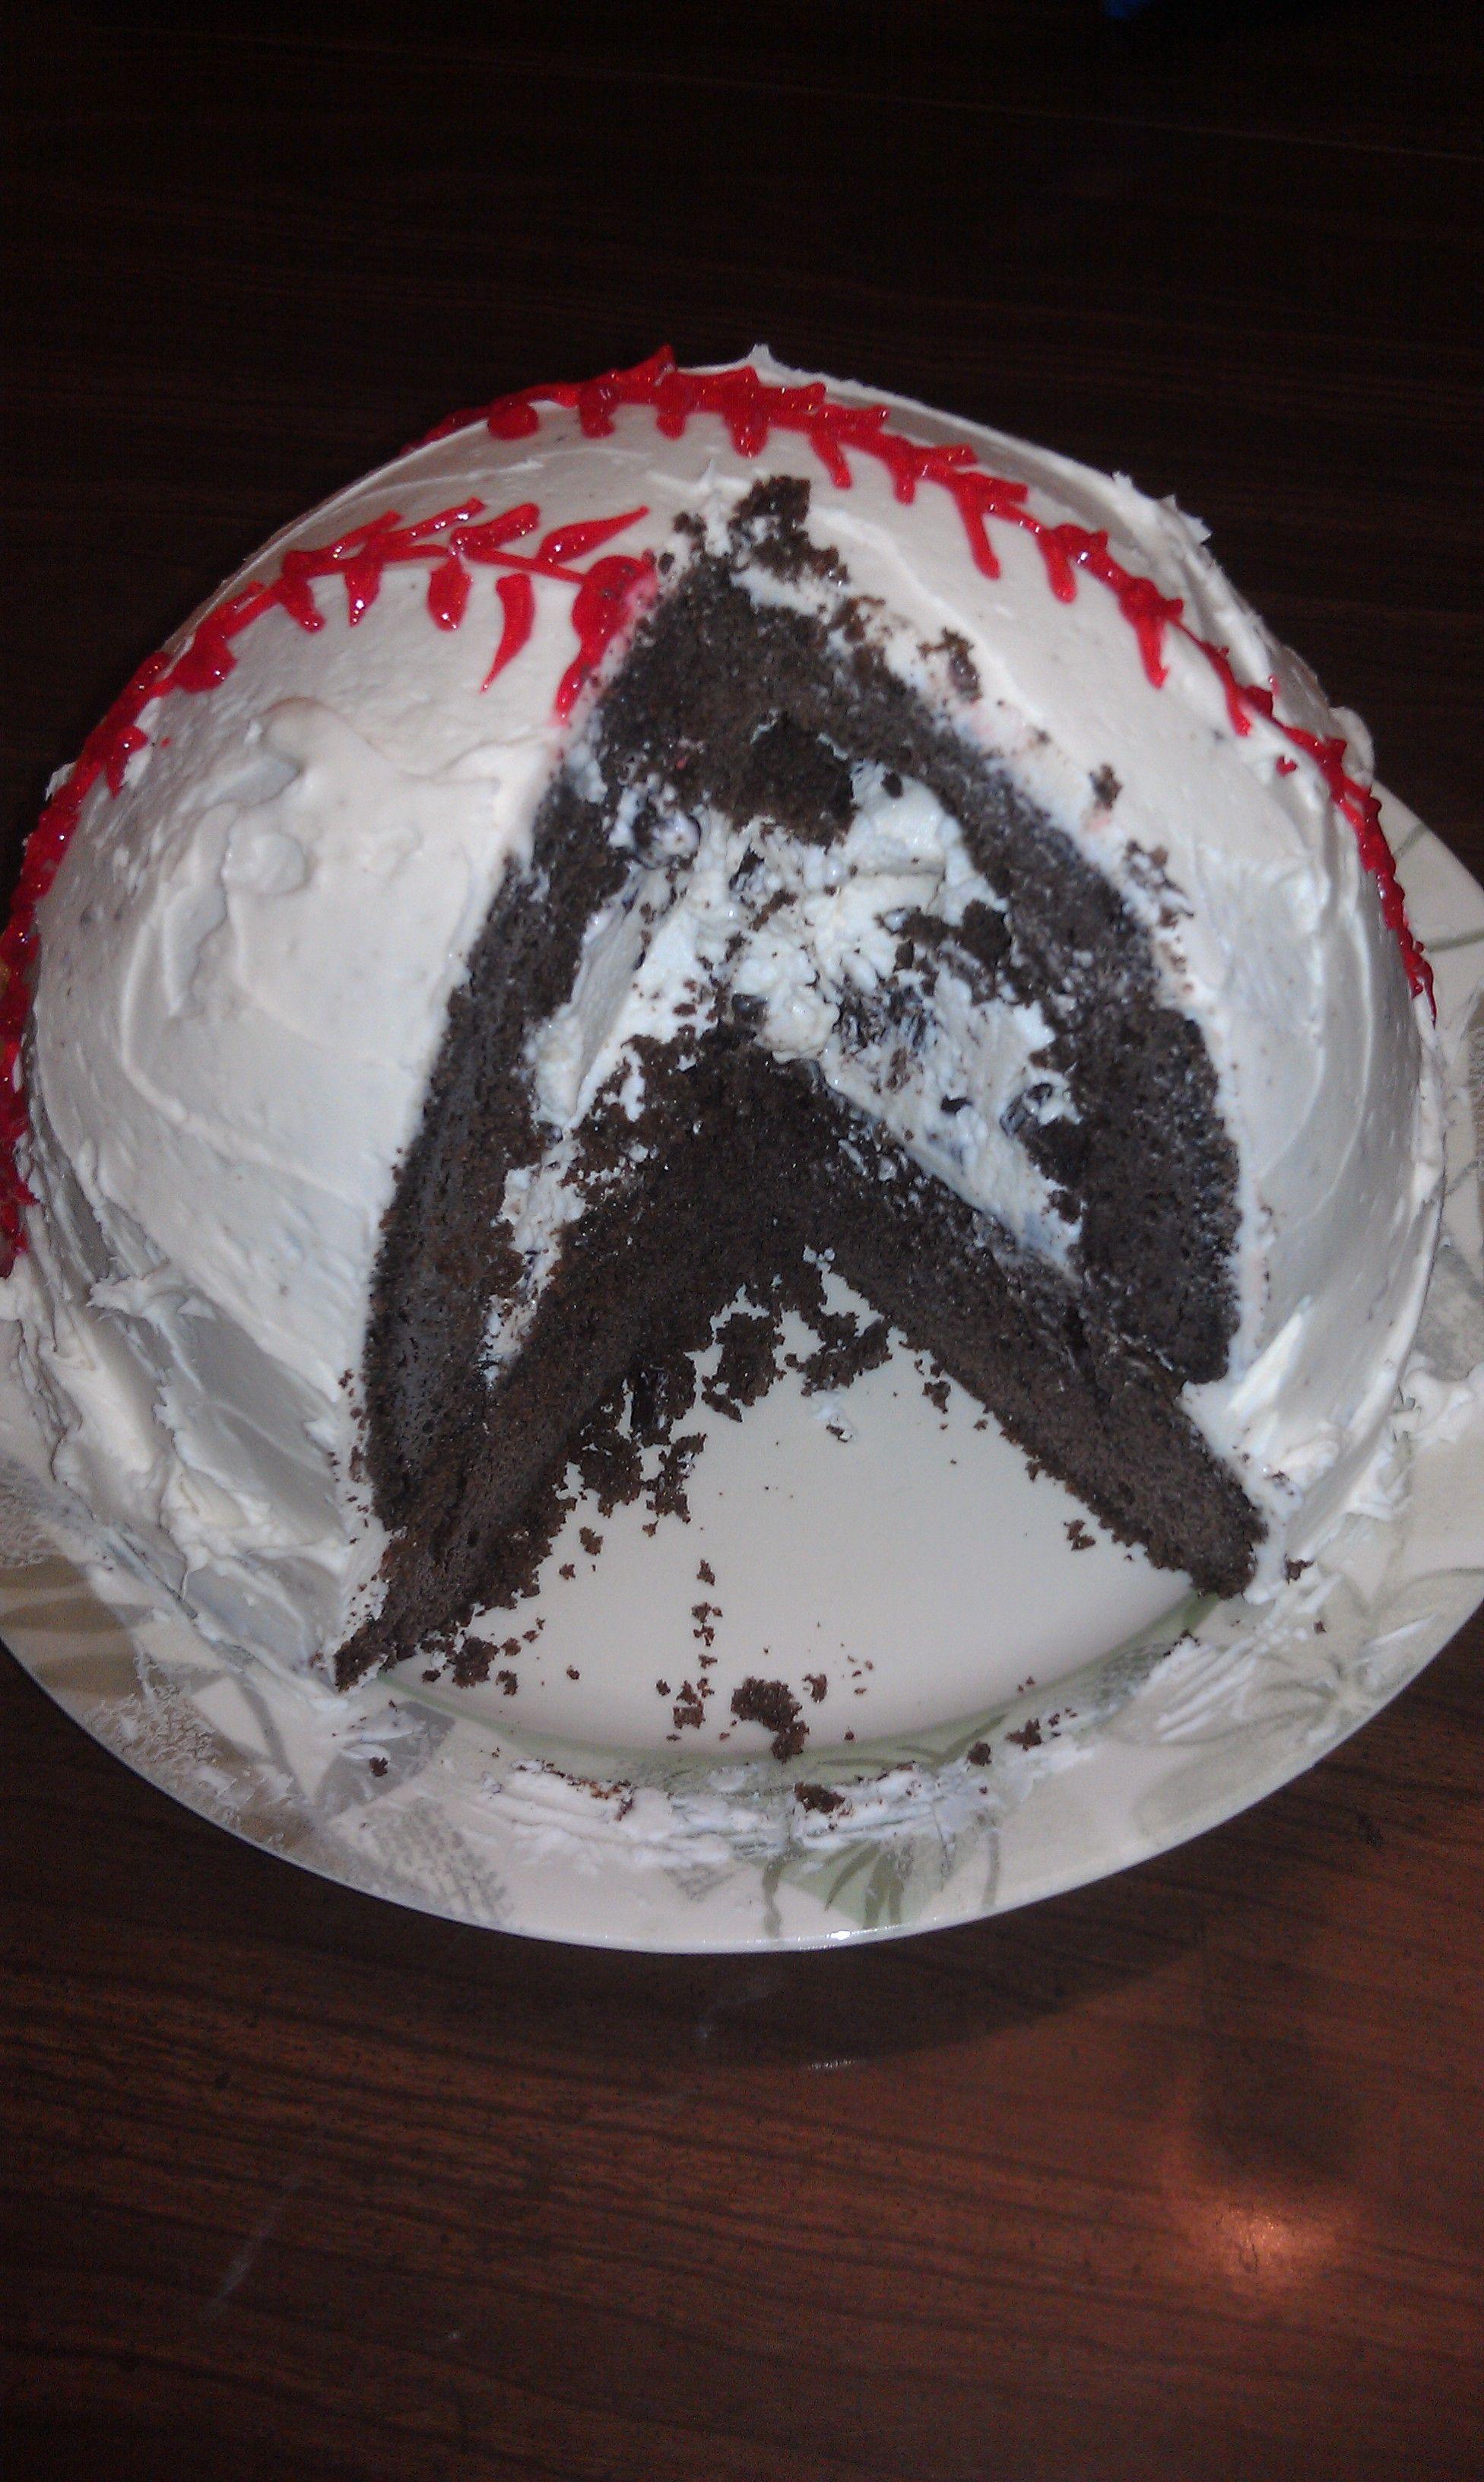 Easy RecipesHow to Make a Baseball Cake